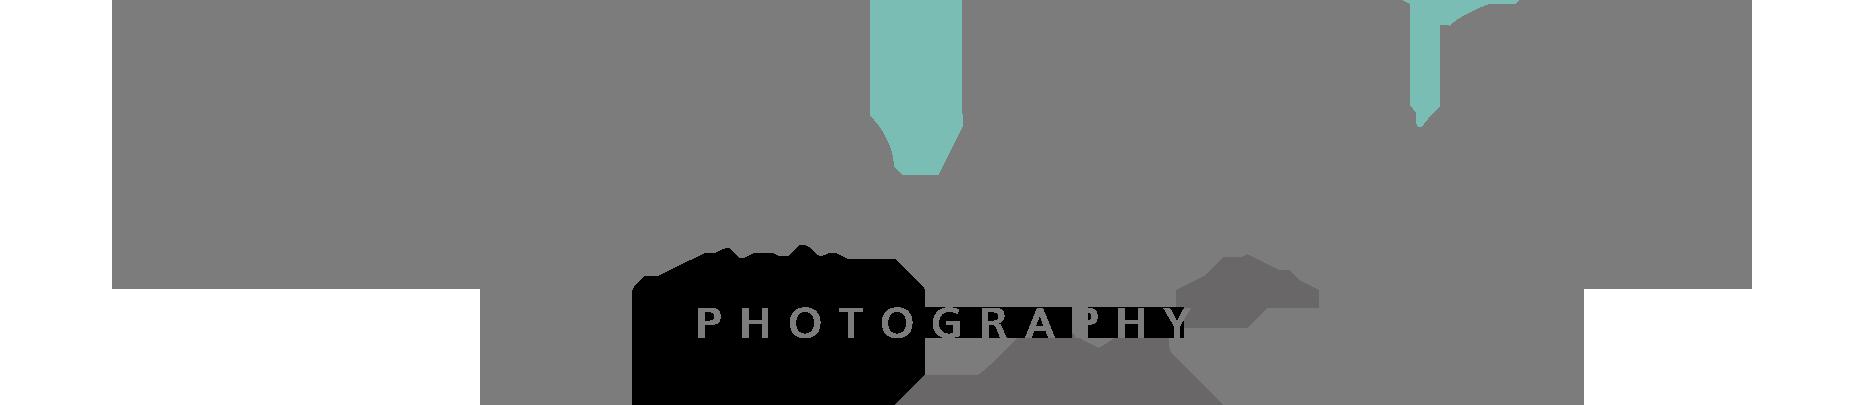 Heather Johnson photography